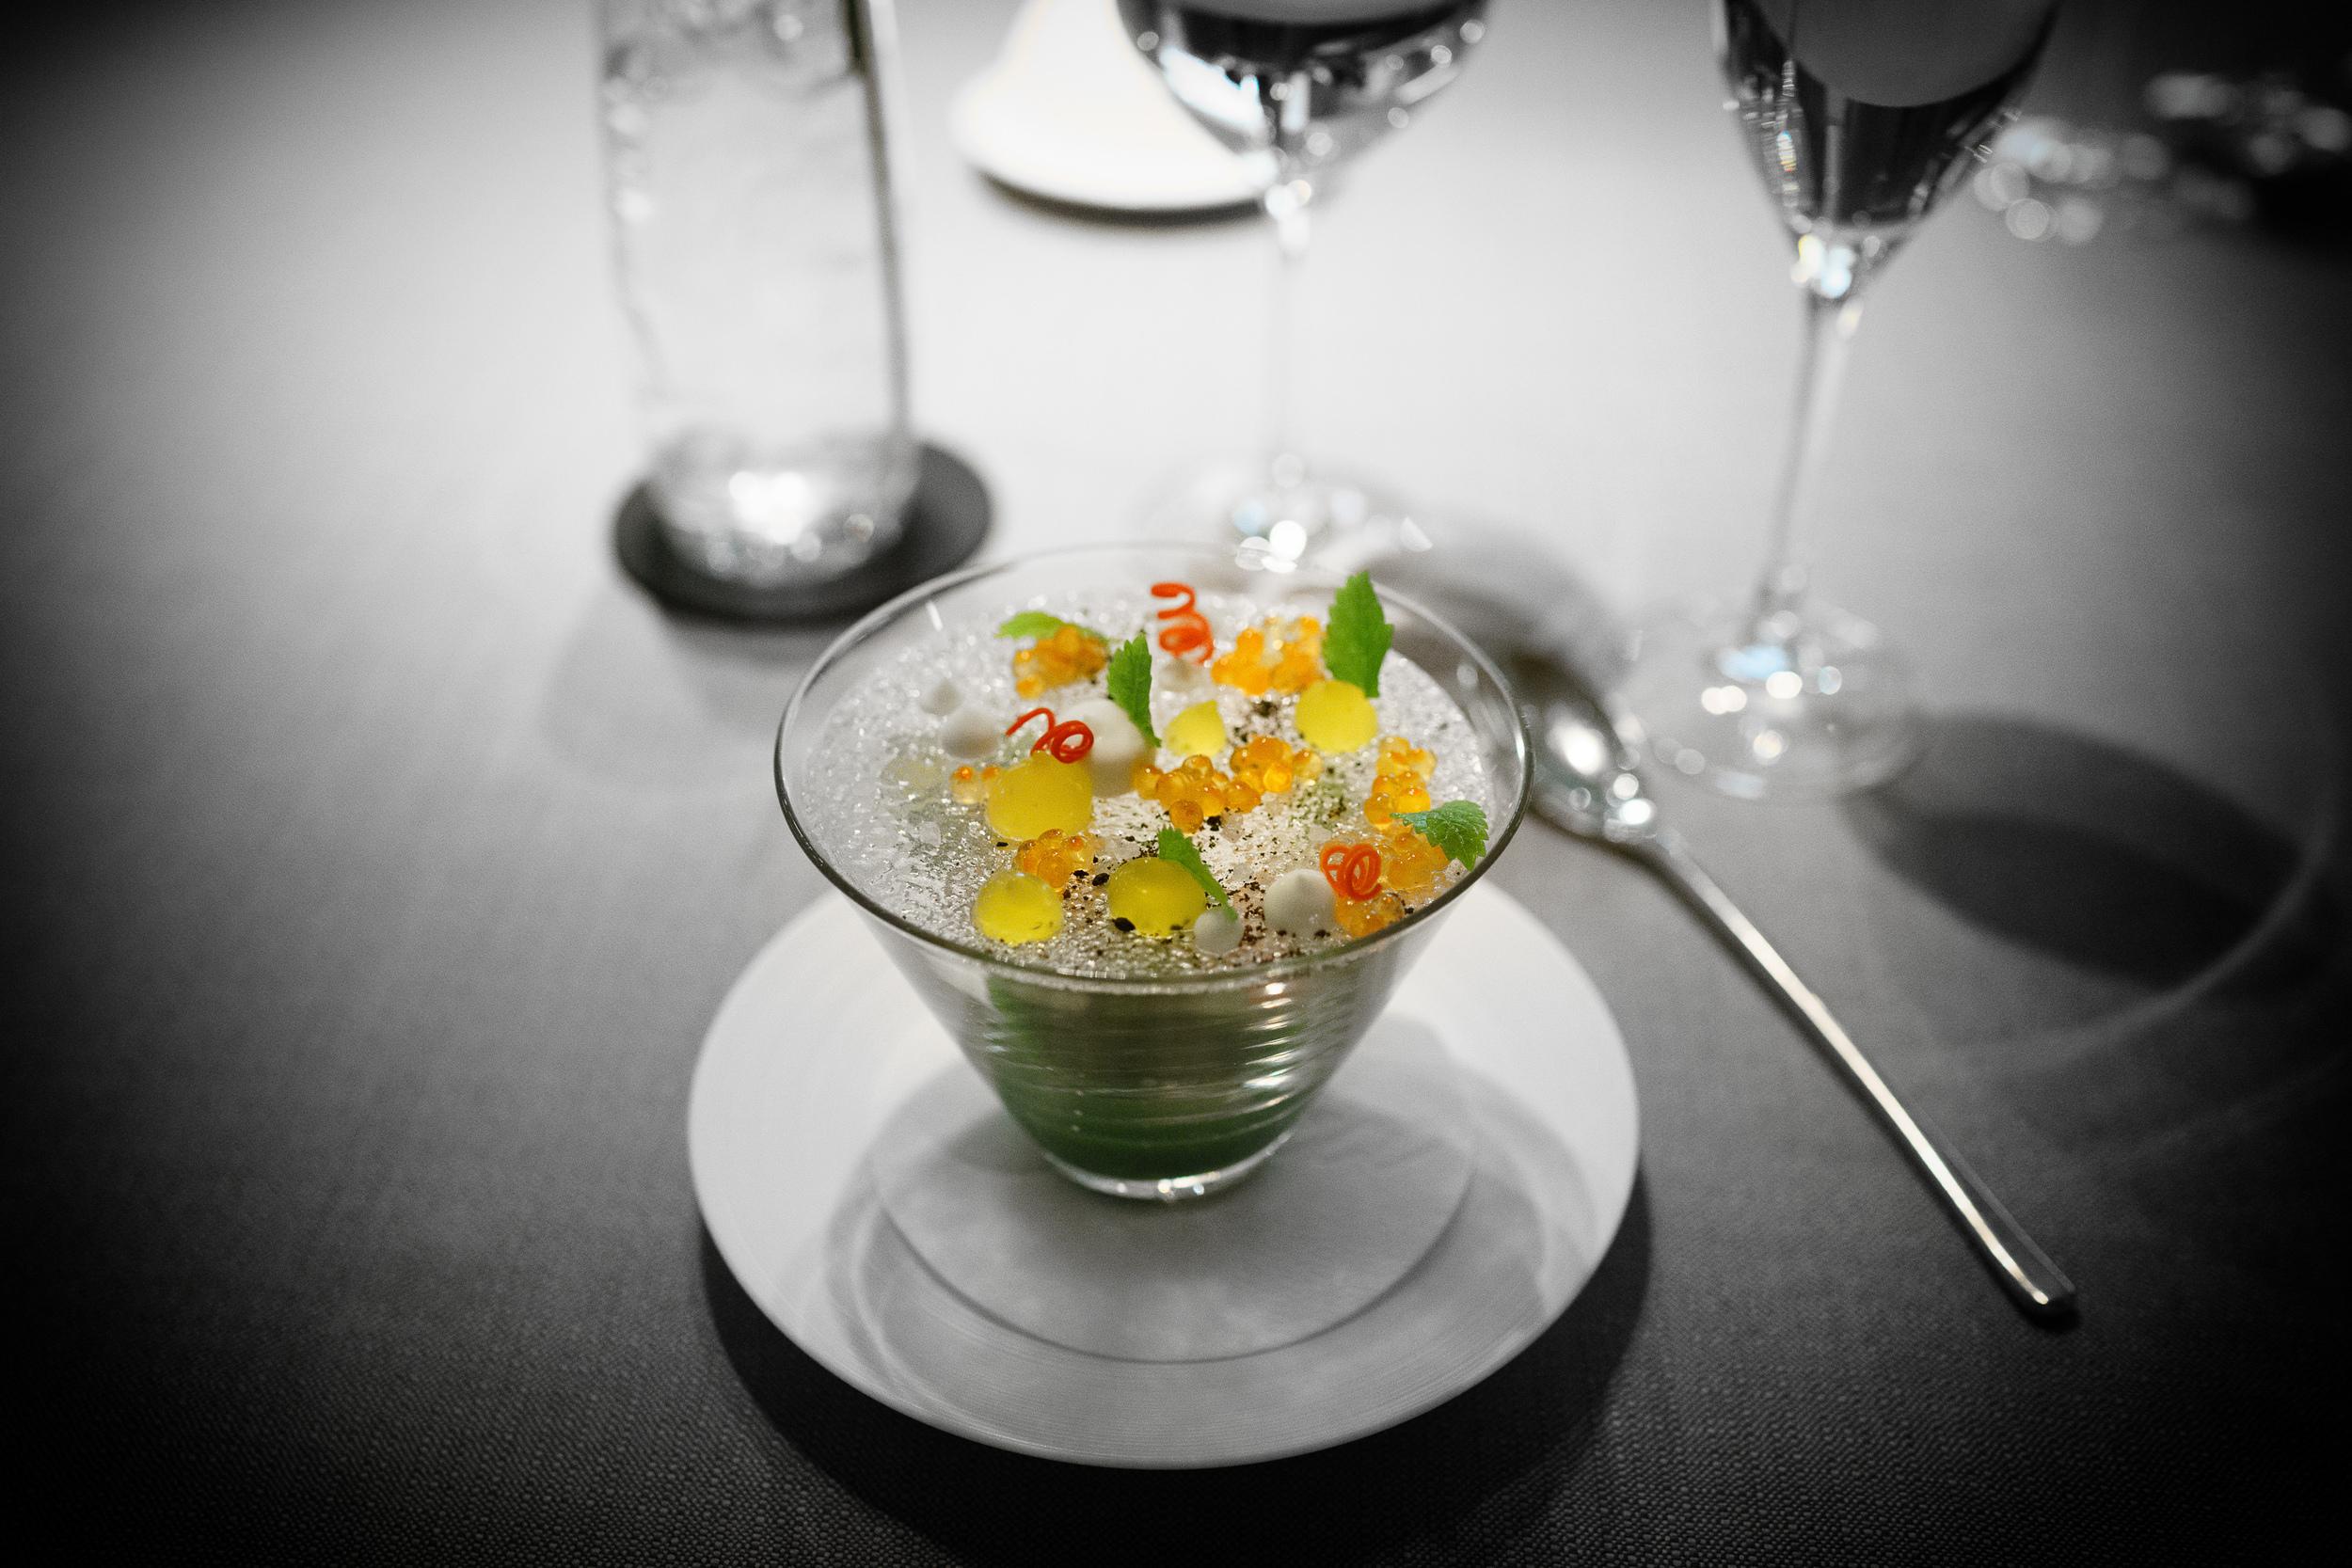 Alaskan King Crab, sudachi, cucumber, lemon mint